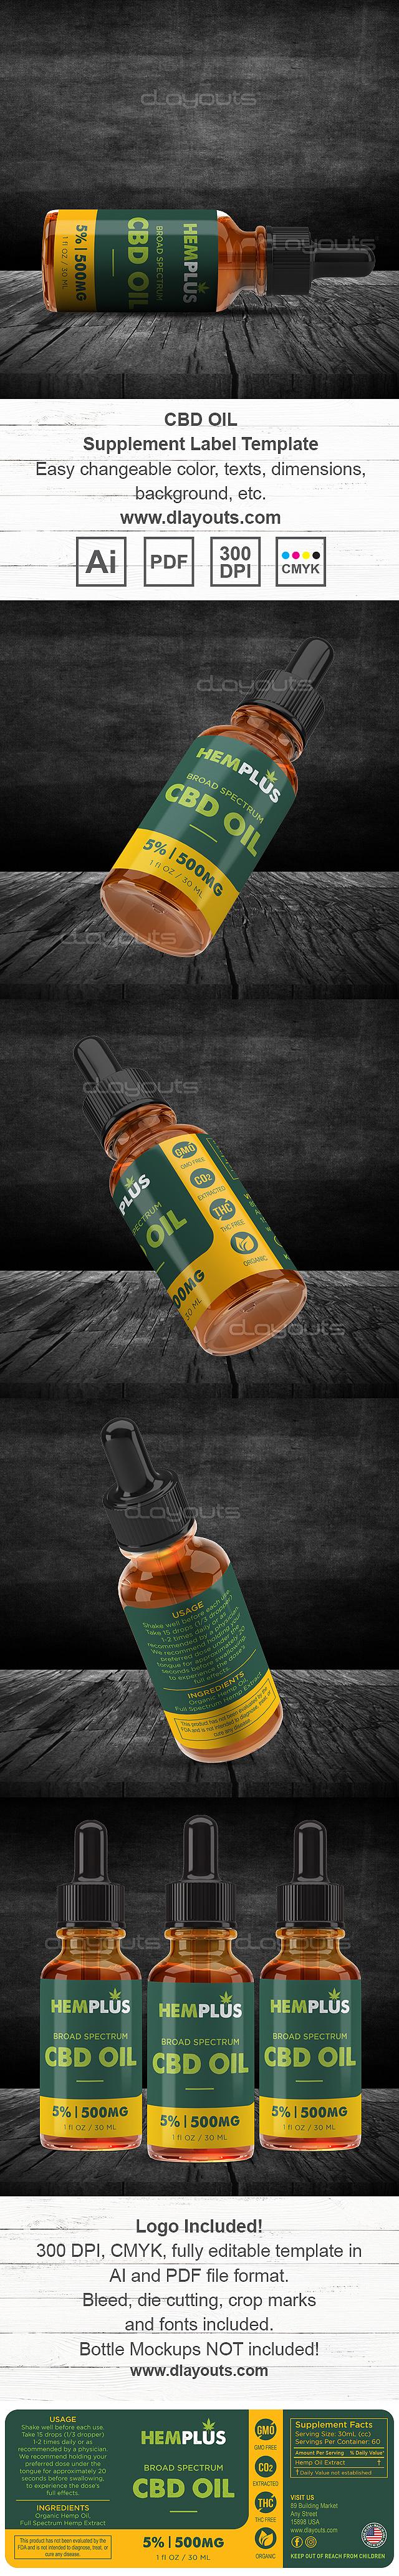 CBD Oil Supplement Label Template